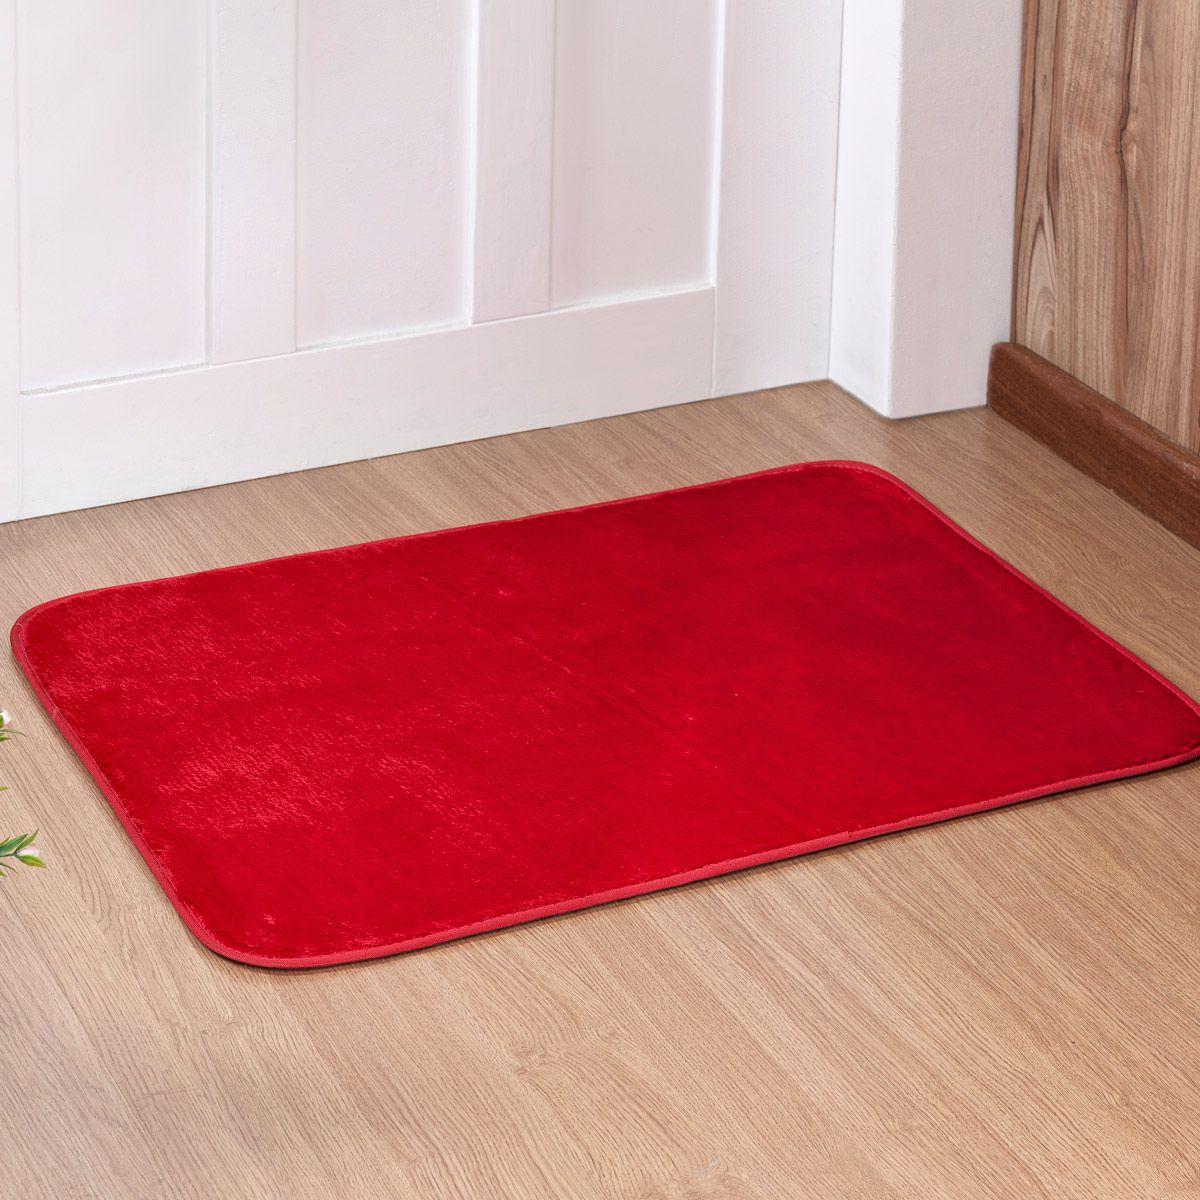 Tapete Retangular Premium p/ Sala Vermelho Liso 0,68m x 0,48m